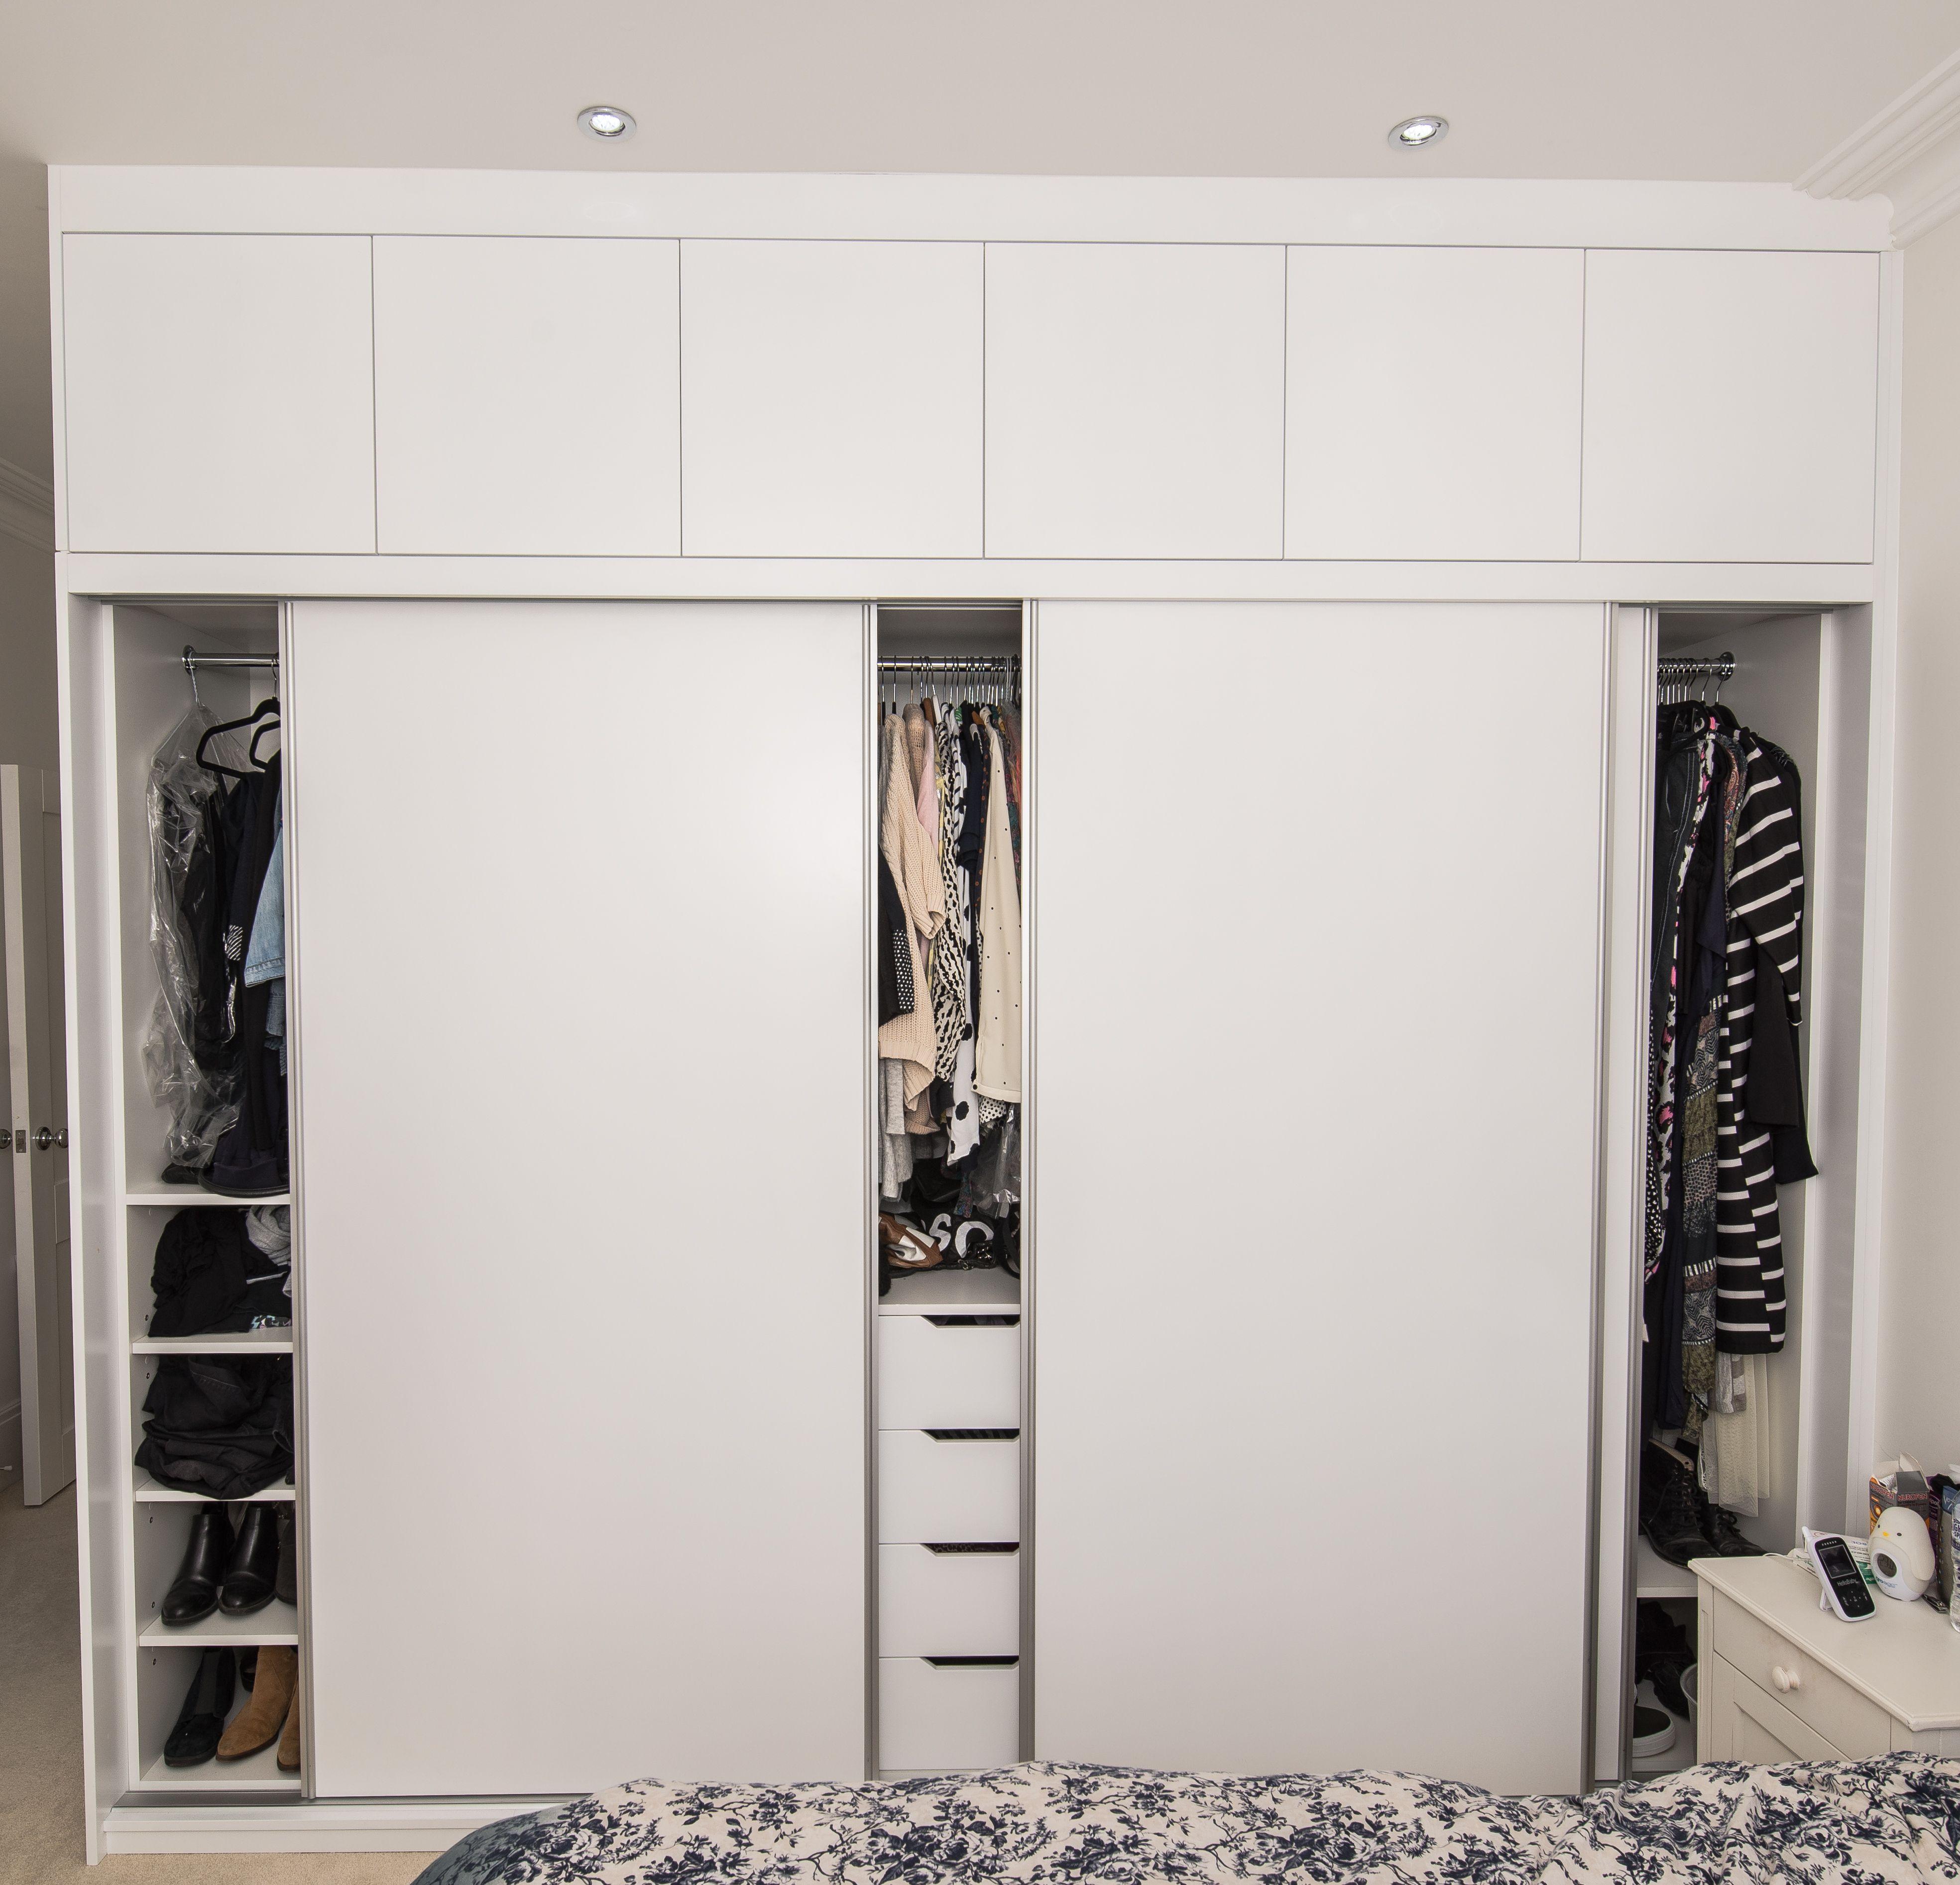 Custom Sprayed Bespoke Built In Sliding Door Wardrobe In White Eggshell Finish Inside You Can Find Hanging Wardrobe Storage Bedroom Wardrobe Built In Wardrobe